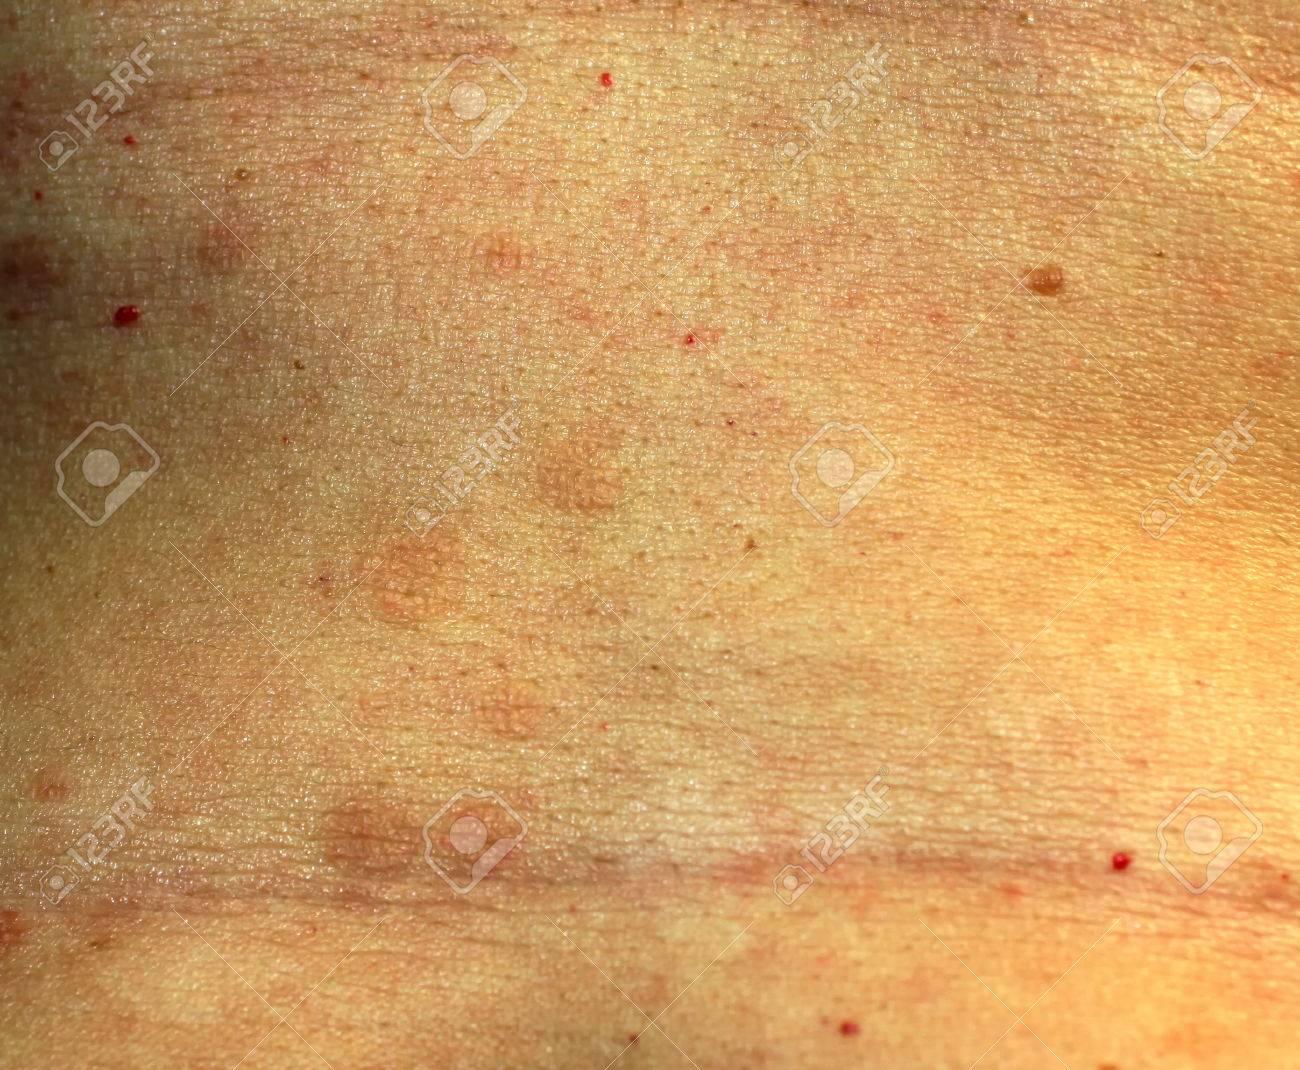 Symptoms of red flat lichen